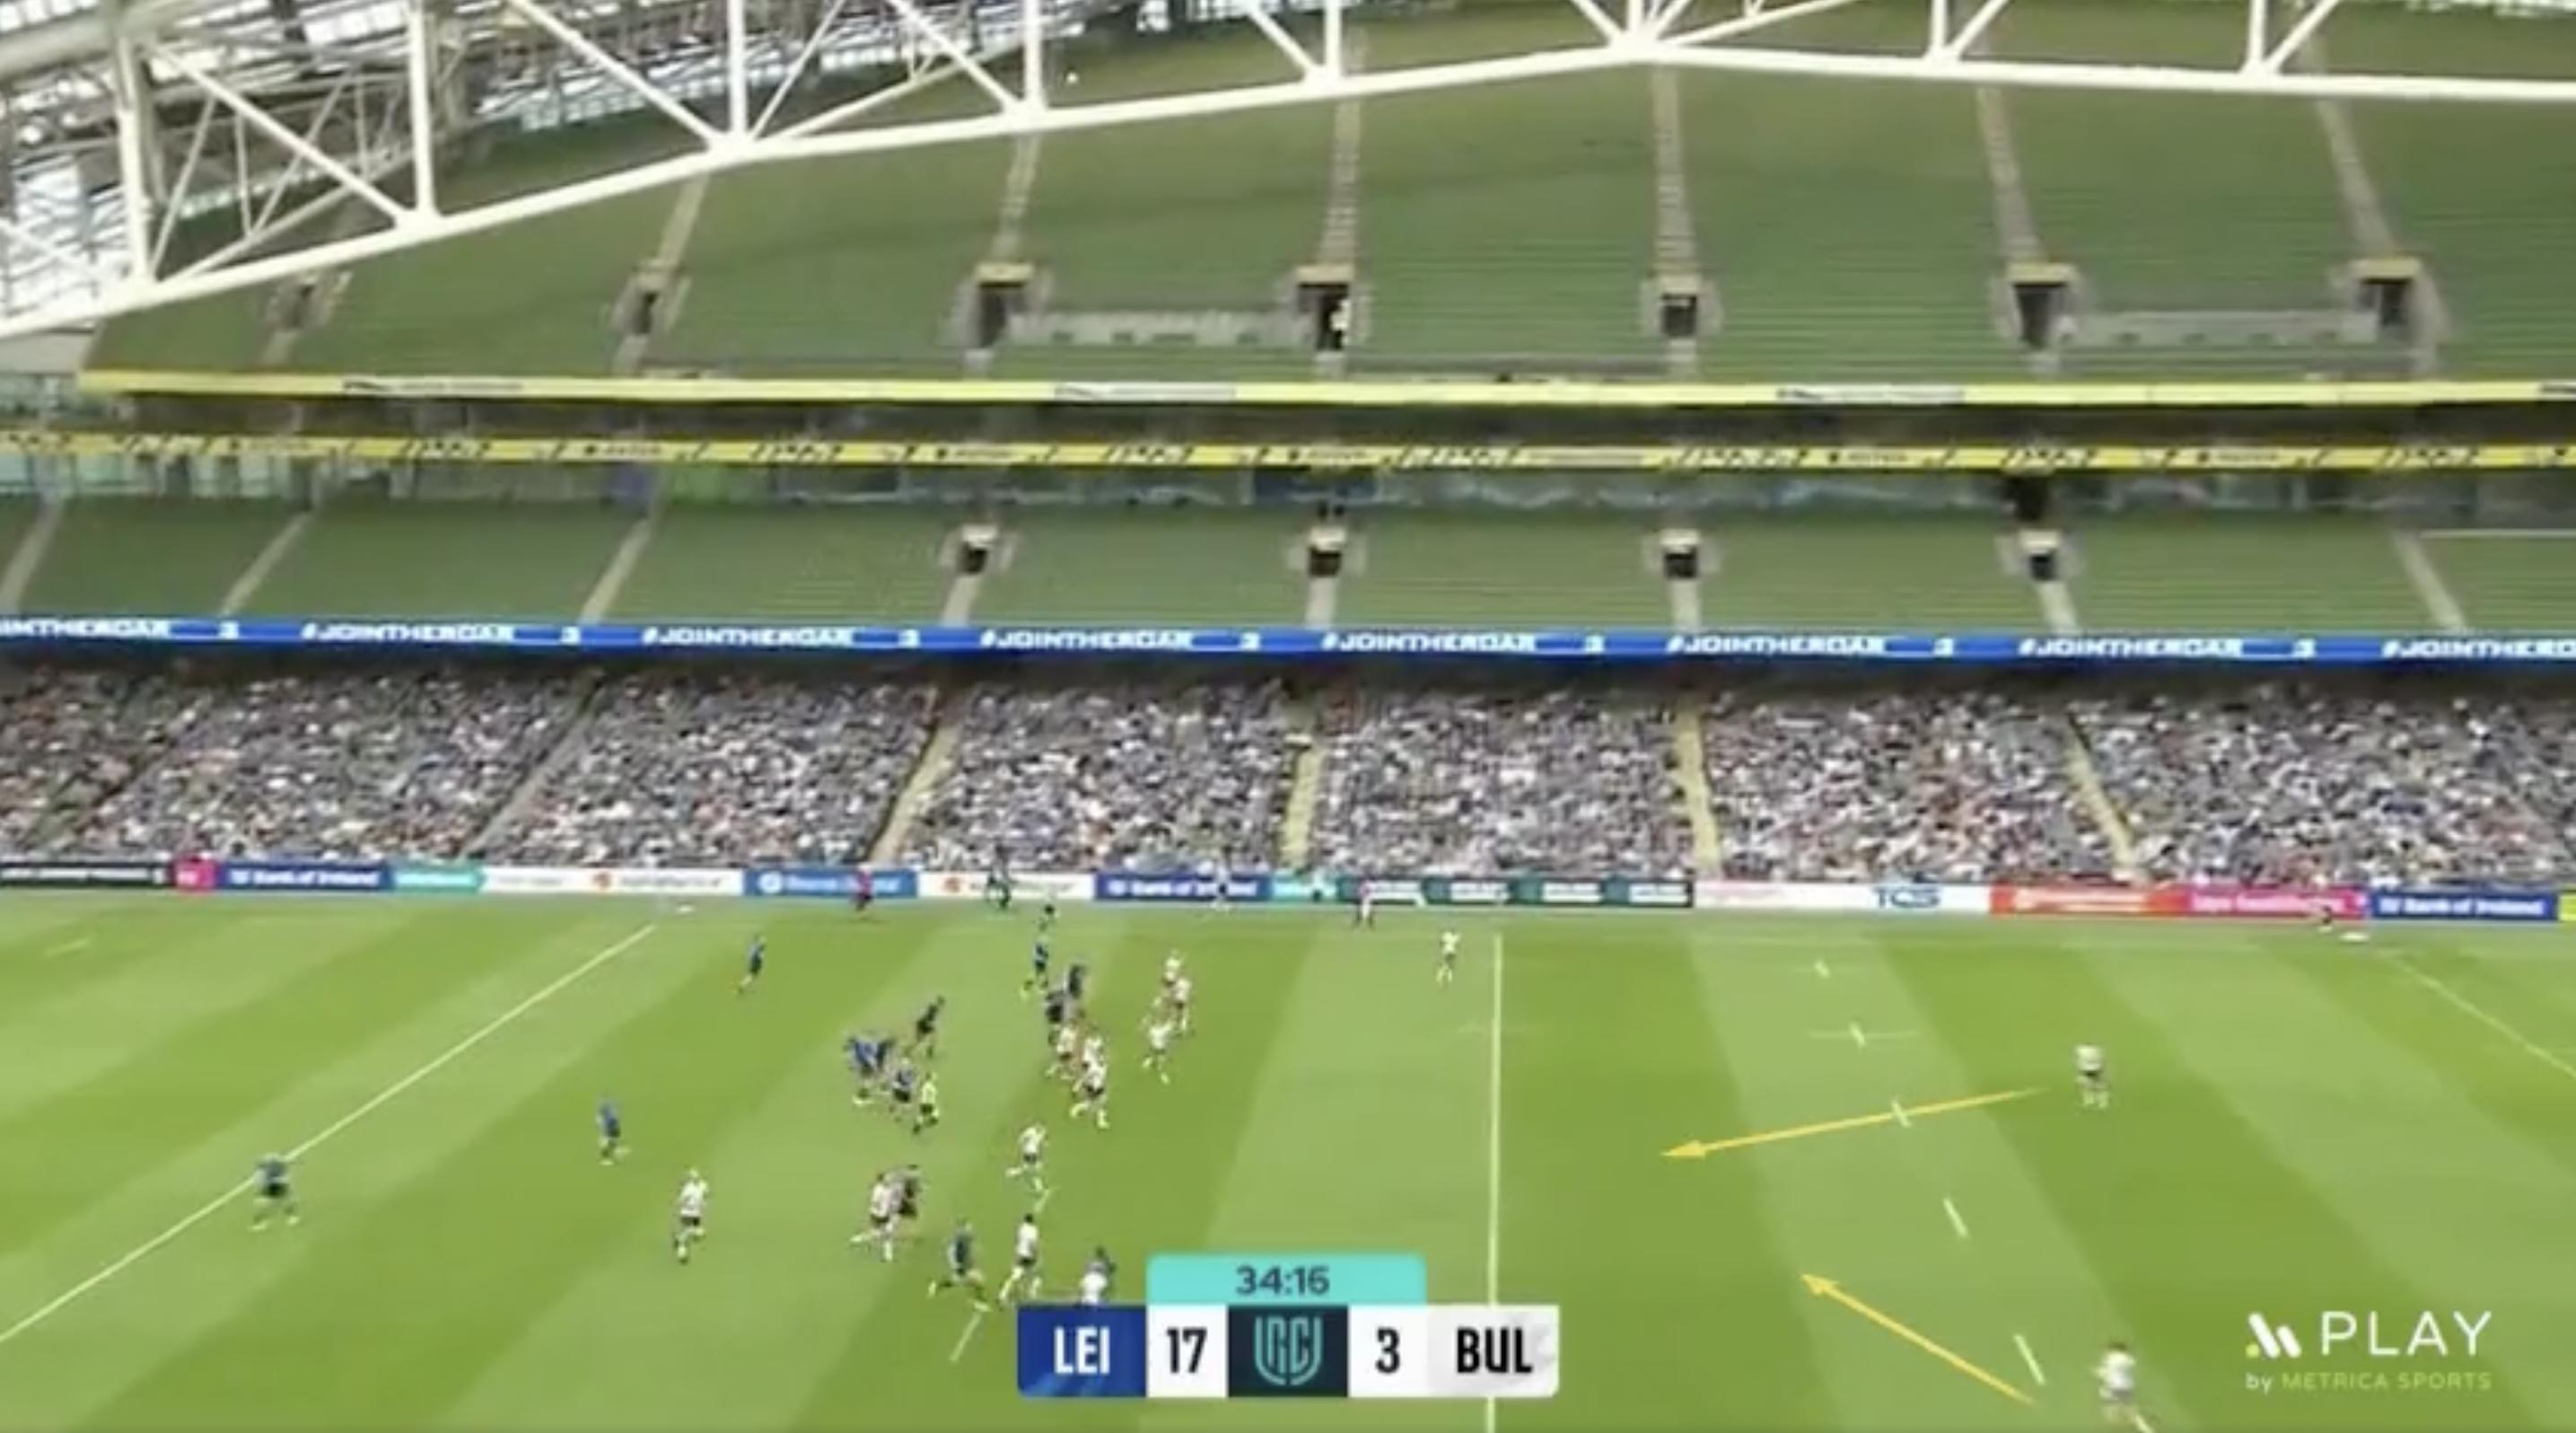 Rugby guru highlights knock-on effect of 50:22